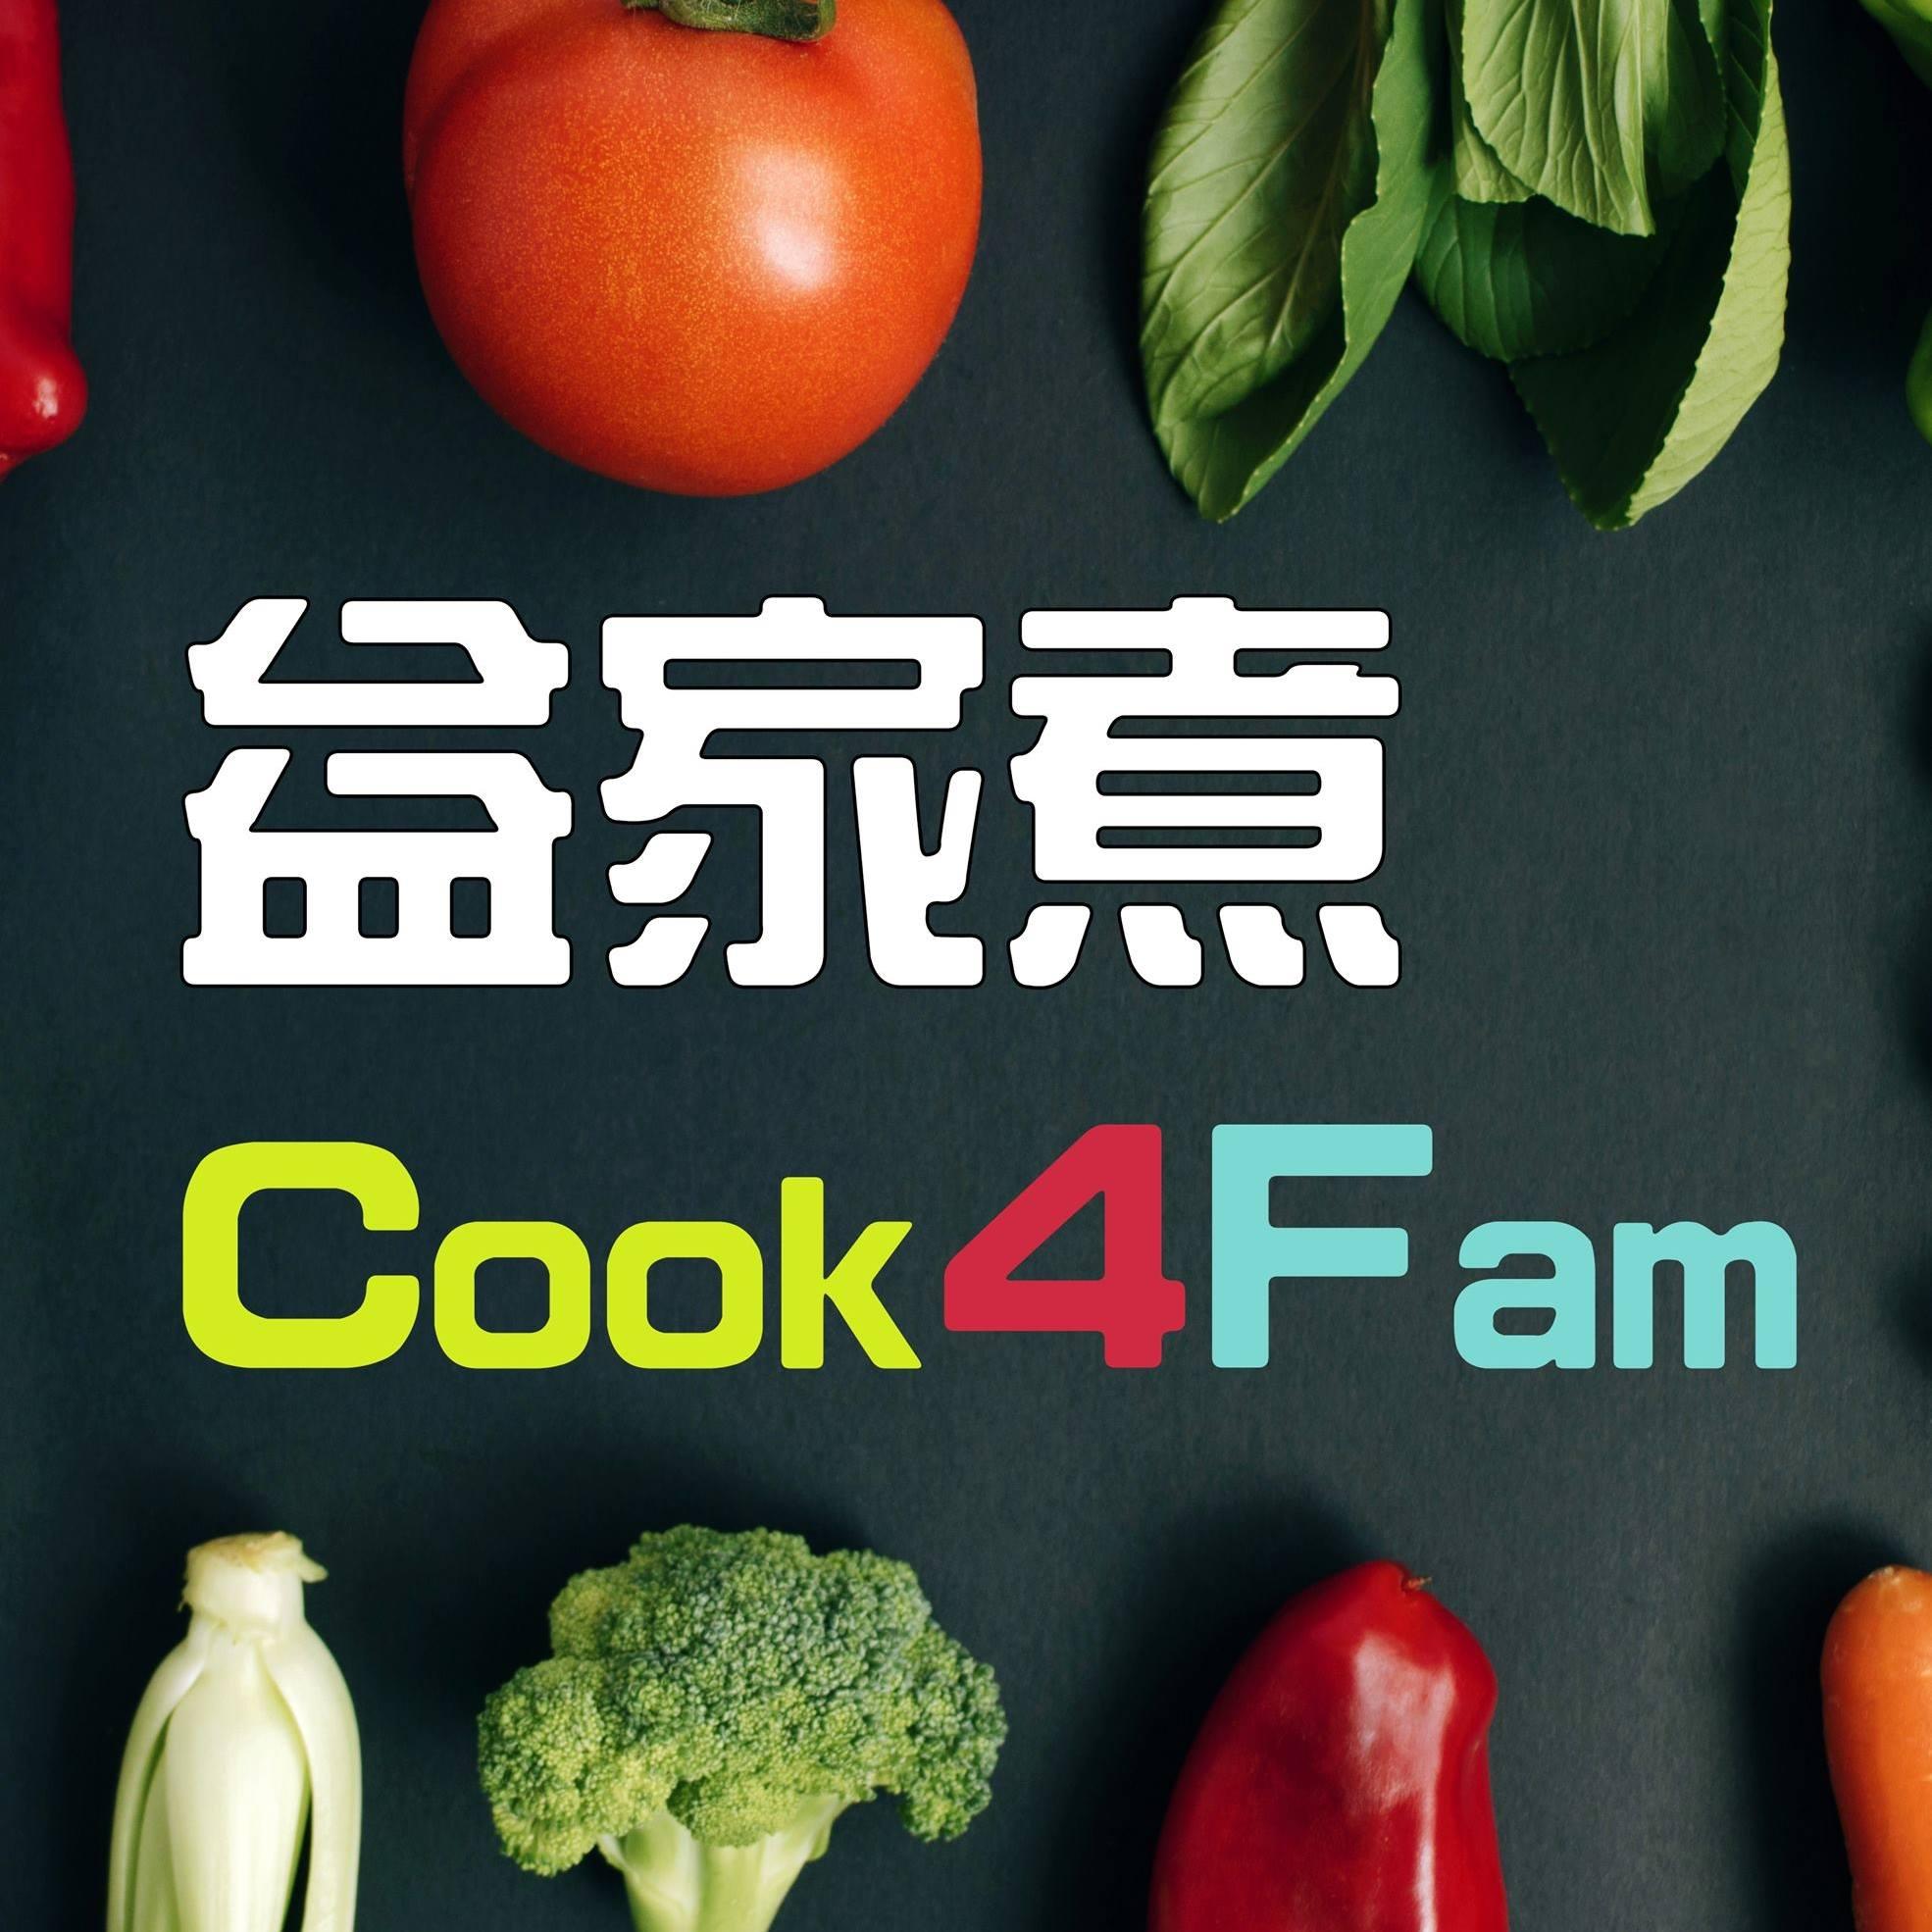 益家煮 Cook4Fam